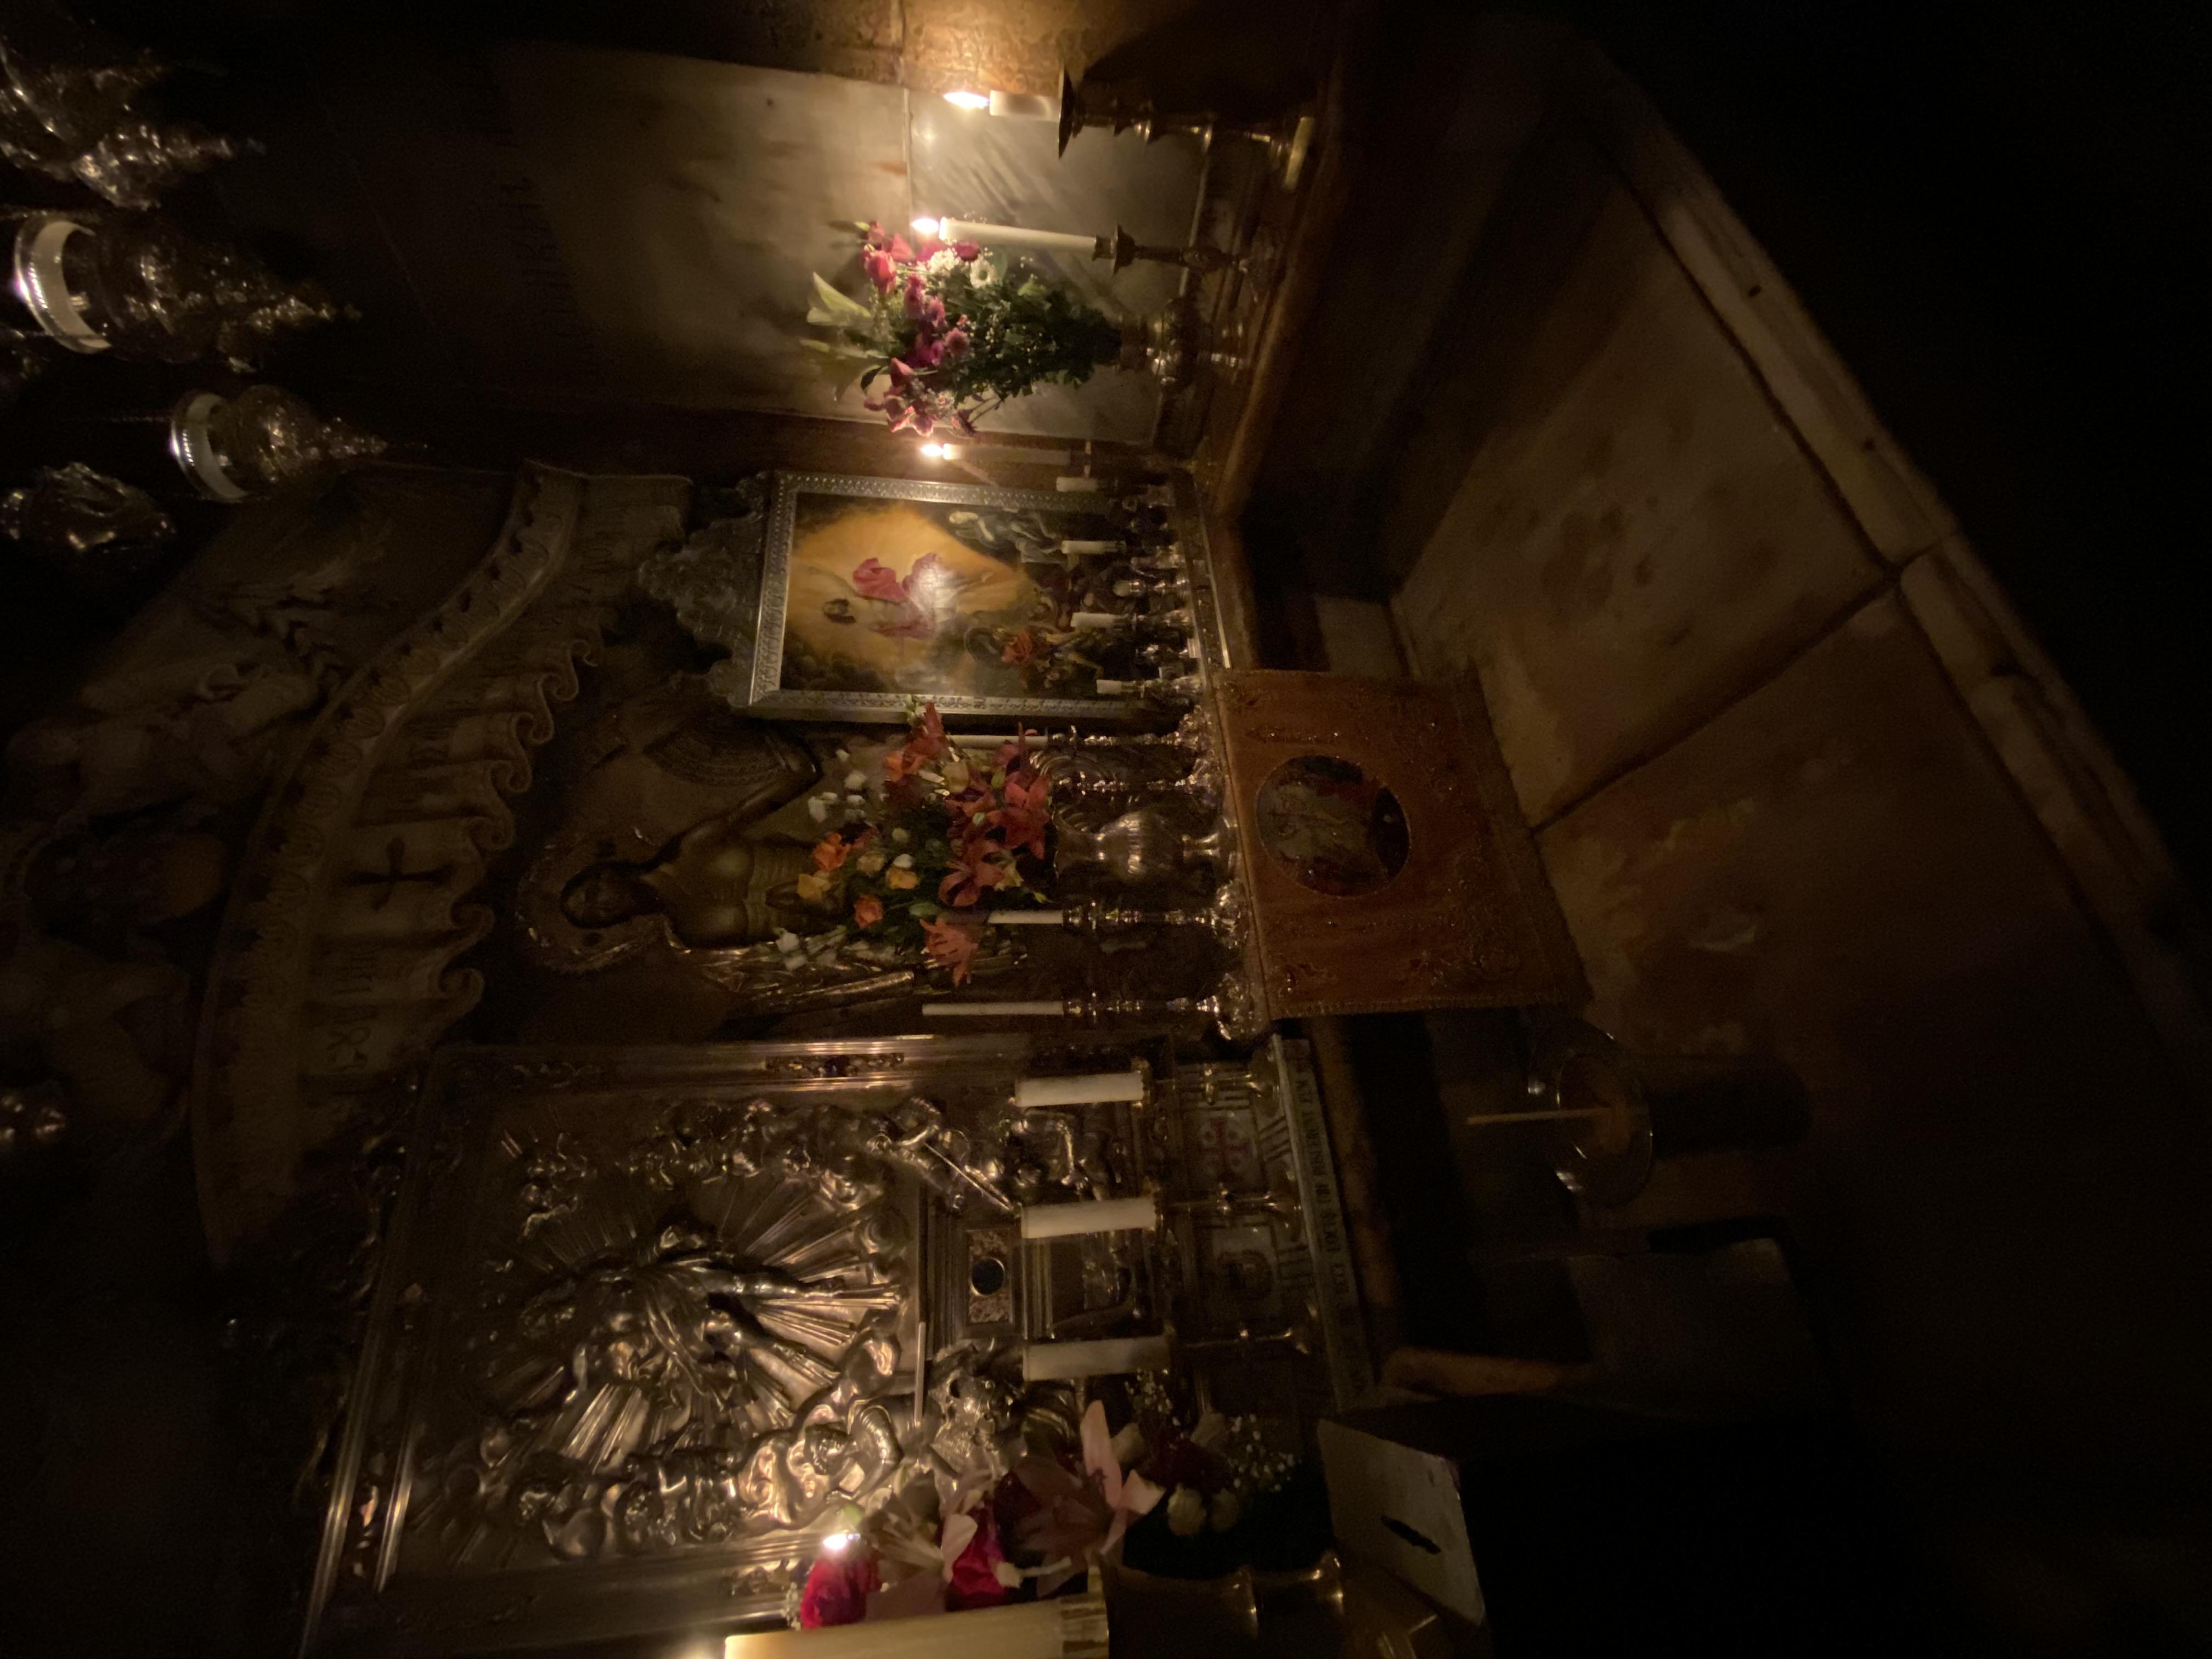 Colm Flynn Holy Land 2021 Jesus' Tomb